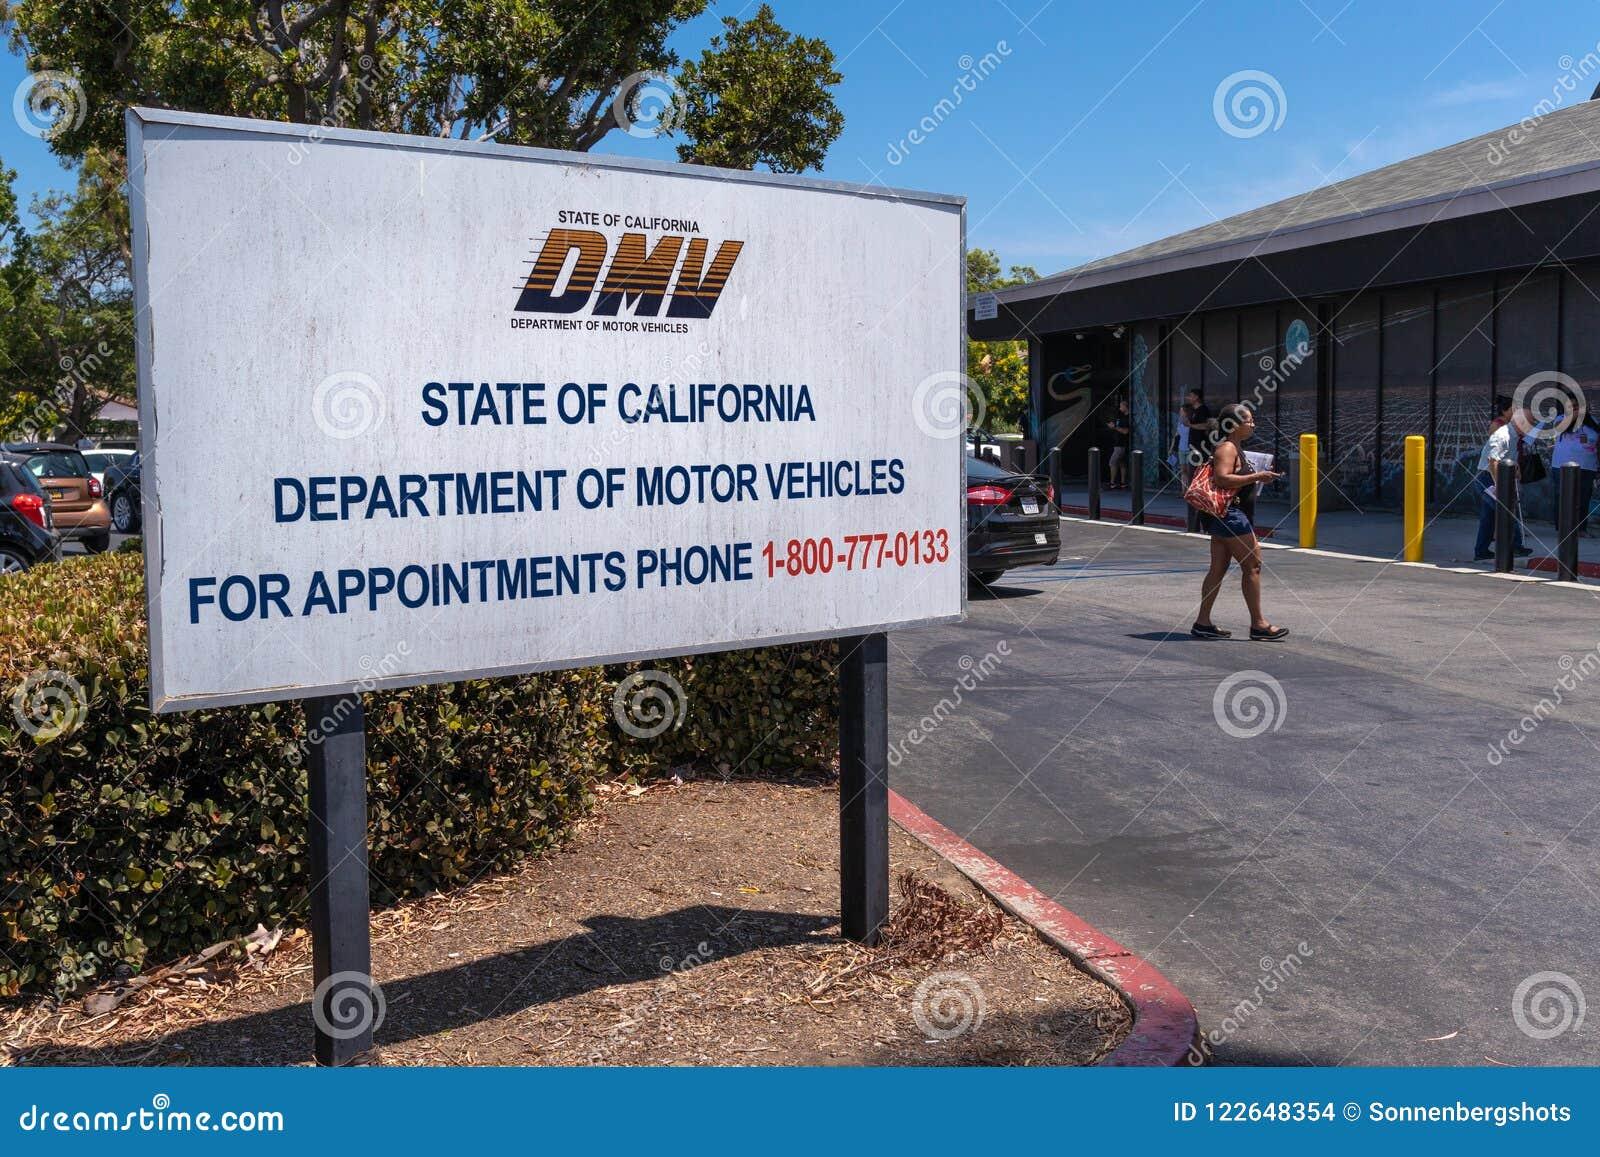 California department of motor vehicles phone number for Sacramento department of motor vehicles